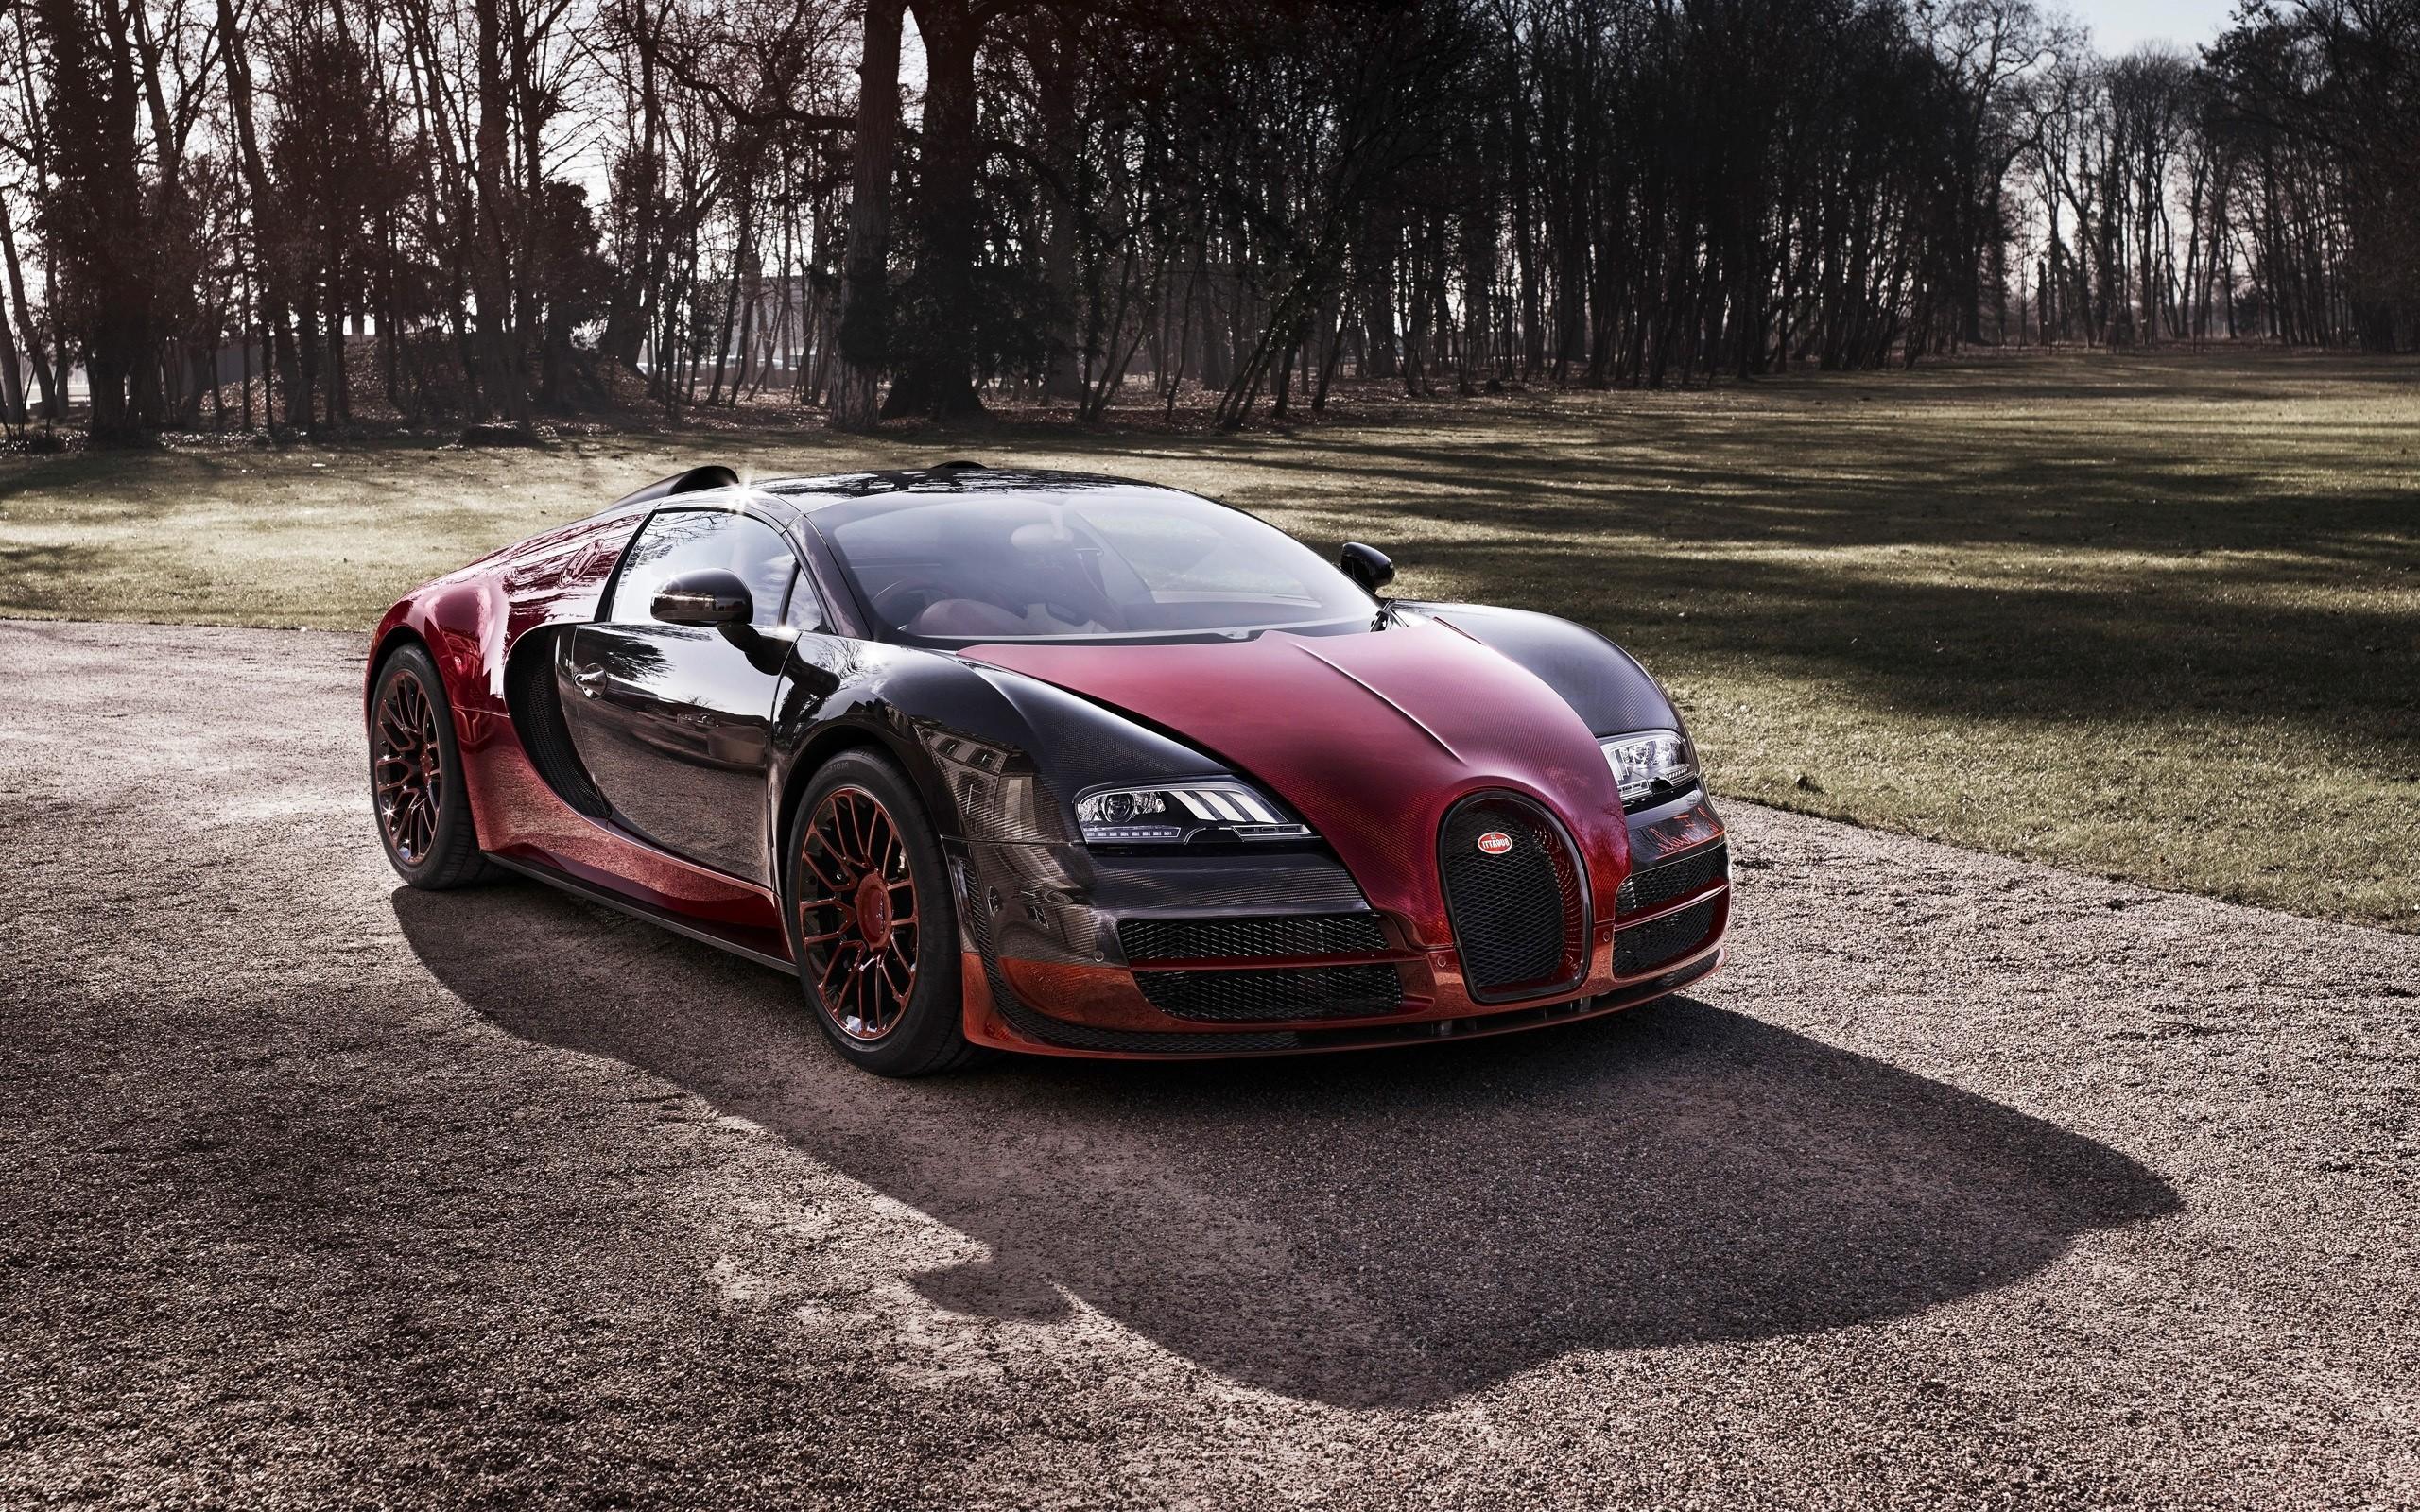 Bugatti Veyron Super Sport 4k Wallpaper: Bugatti Veyron 3, HD Cars, 4k Wallpapers, Images